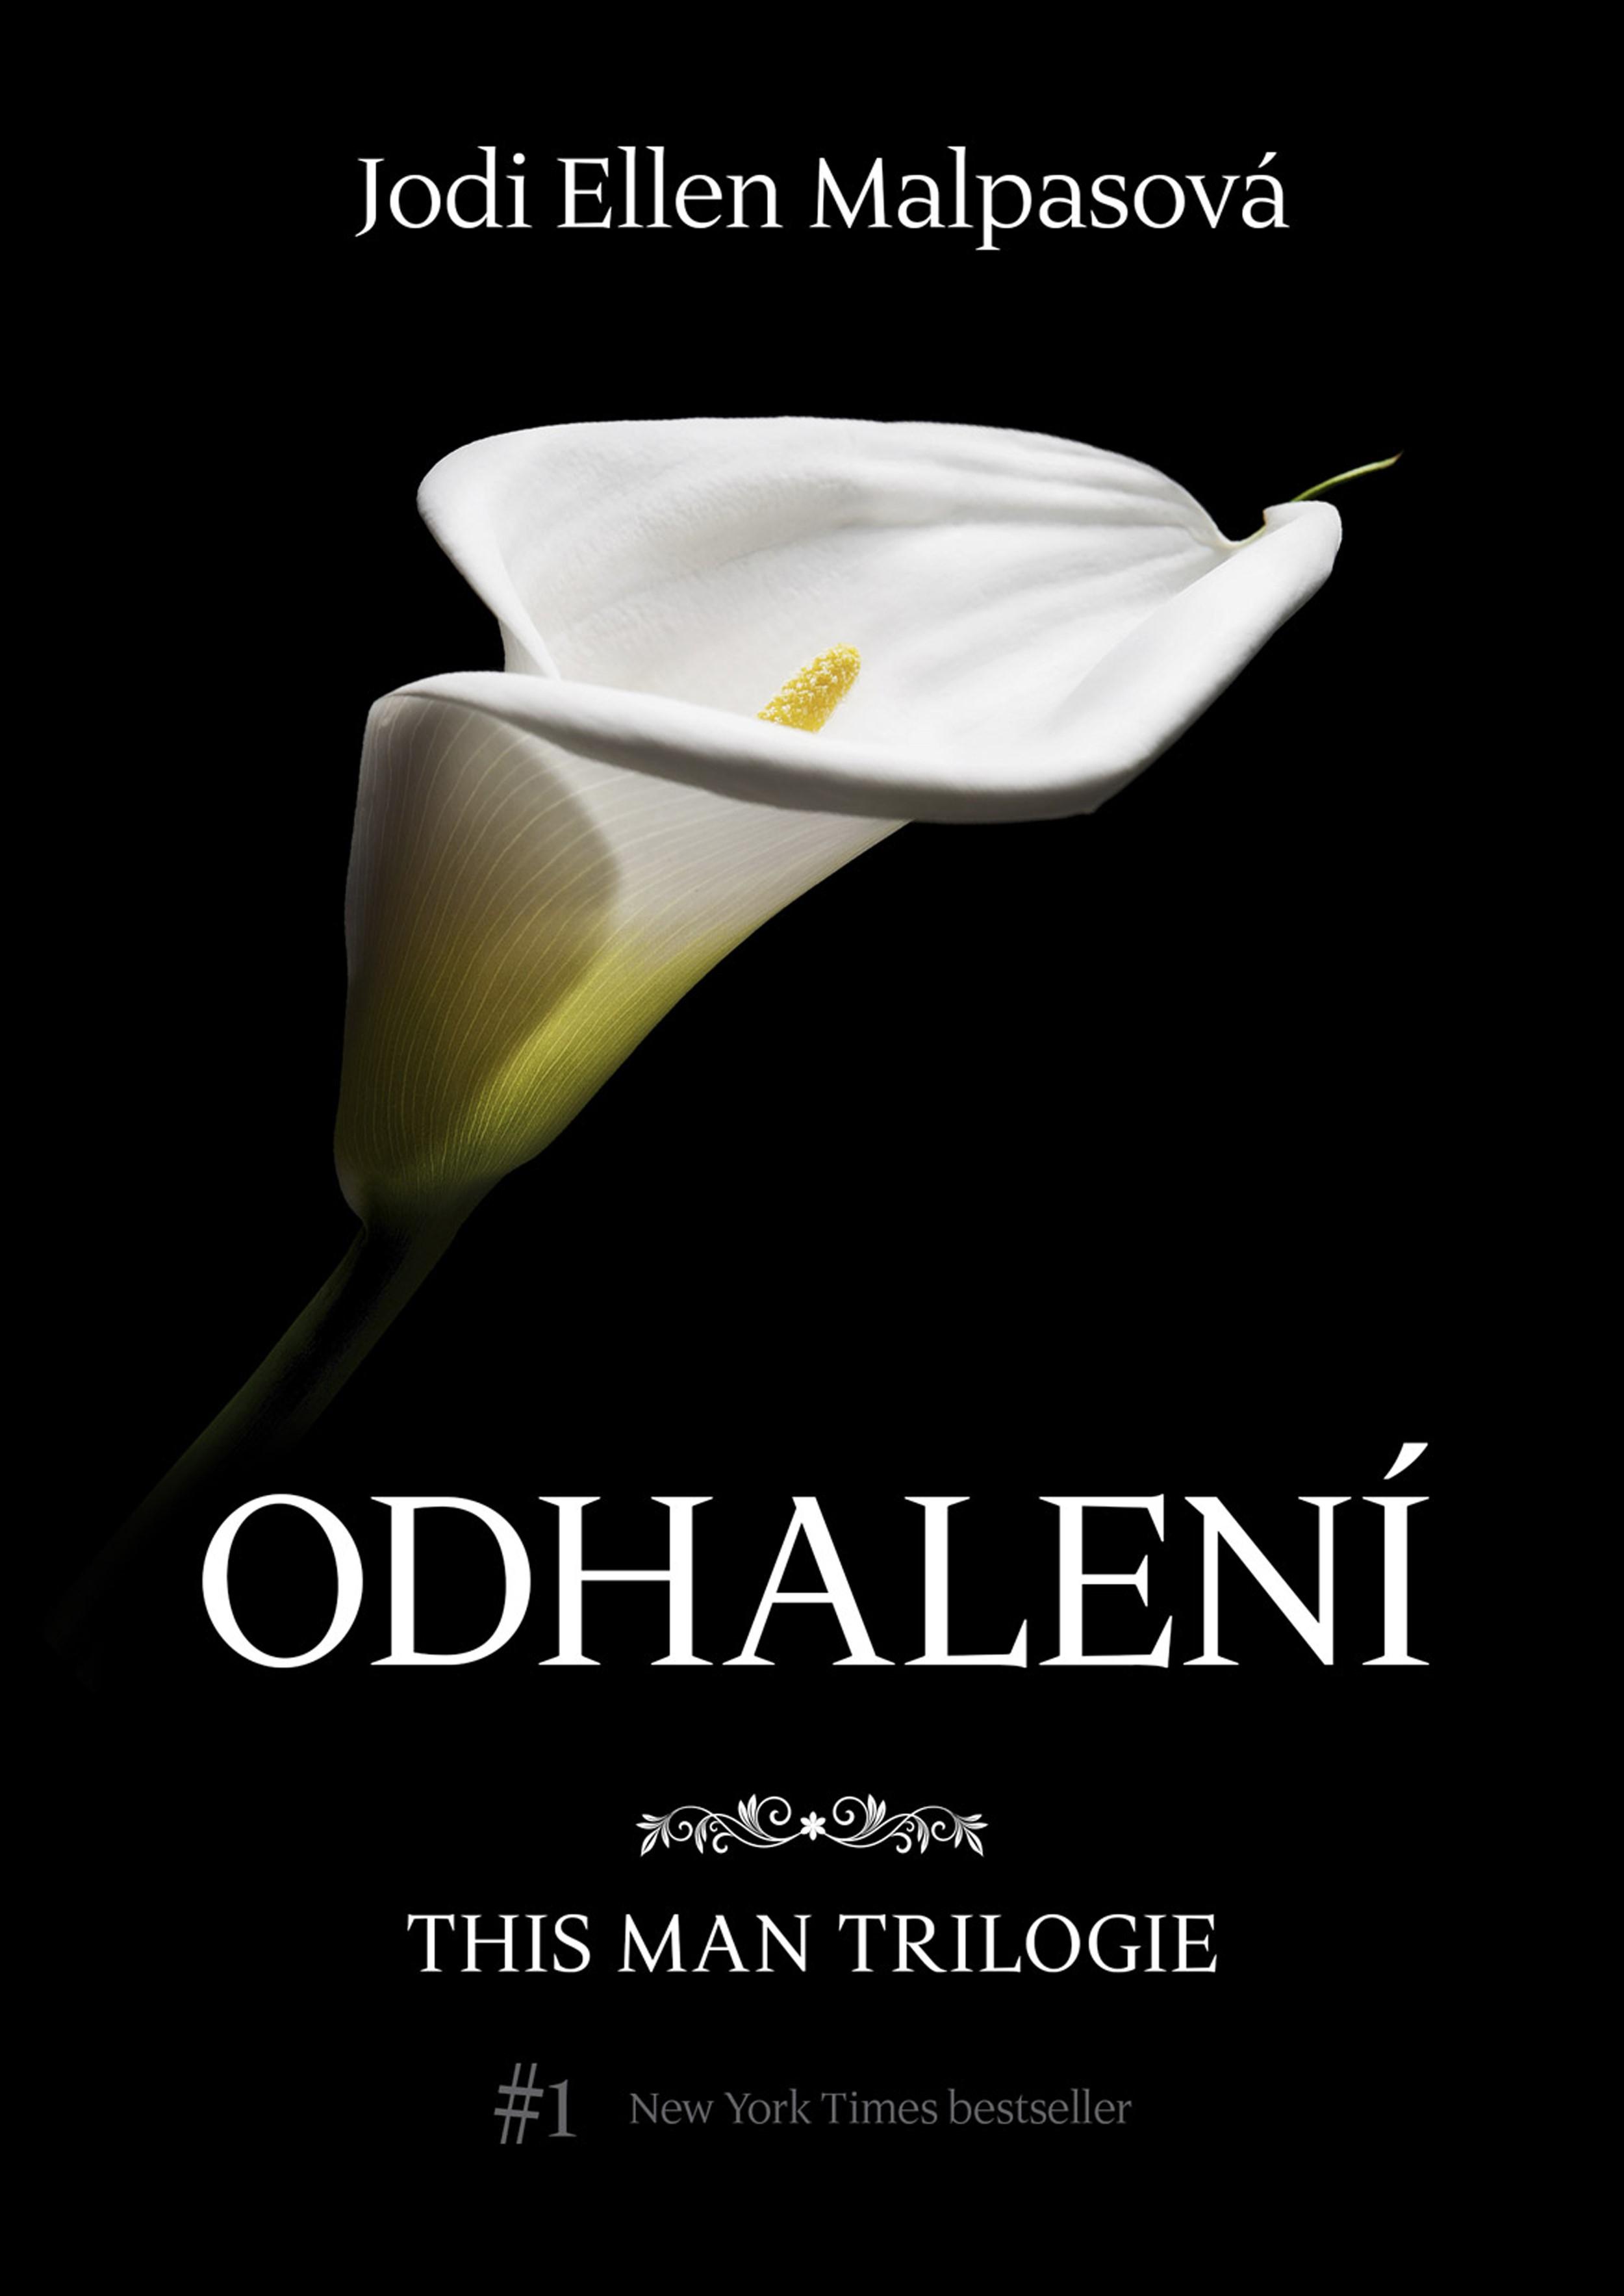 ODHALENÍ - THIS MAN 1